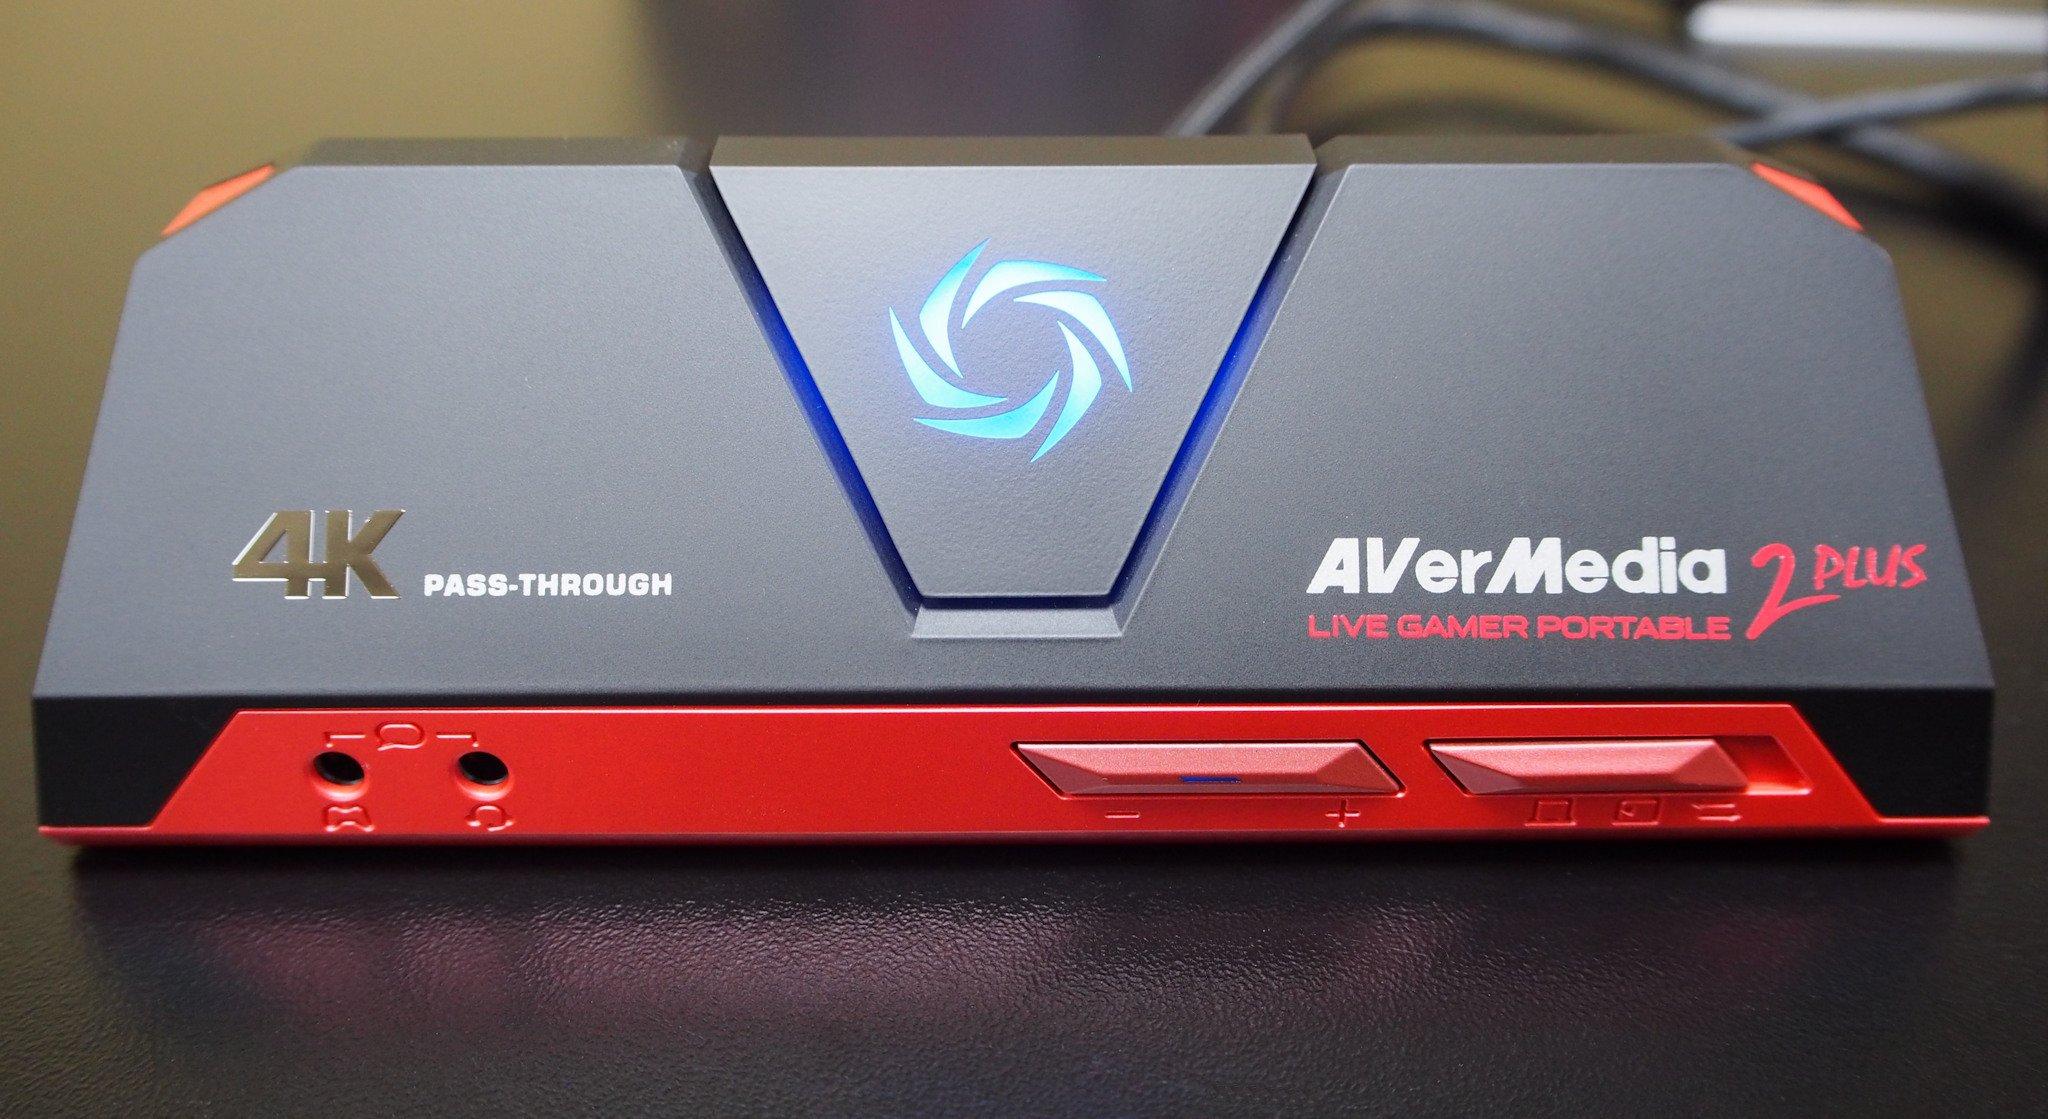 AVerMedia Live Gamer Portable 2 Plus Capture Device Has 4K